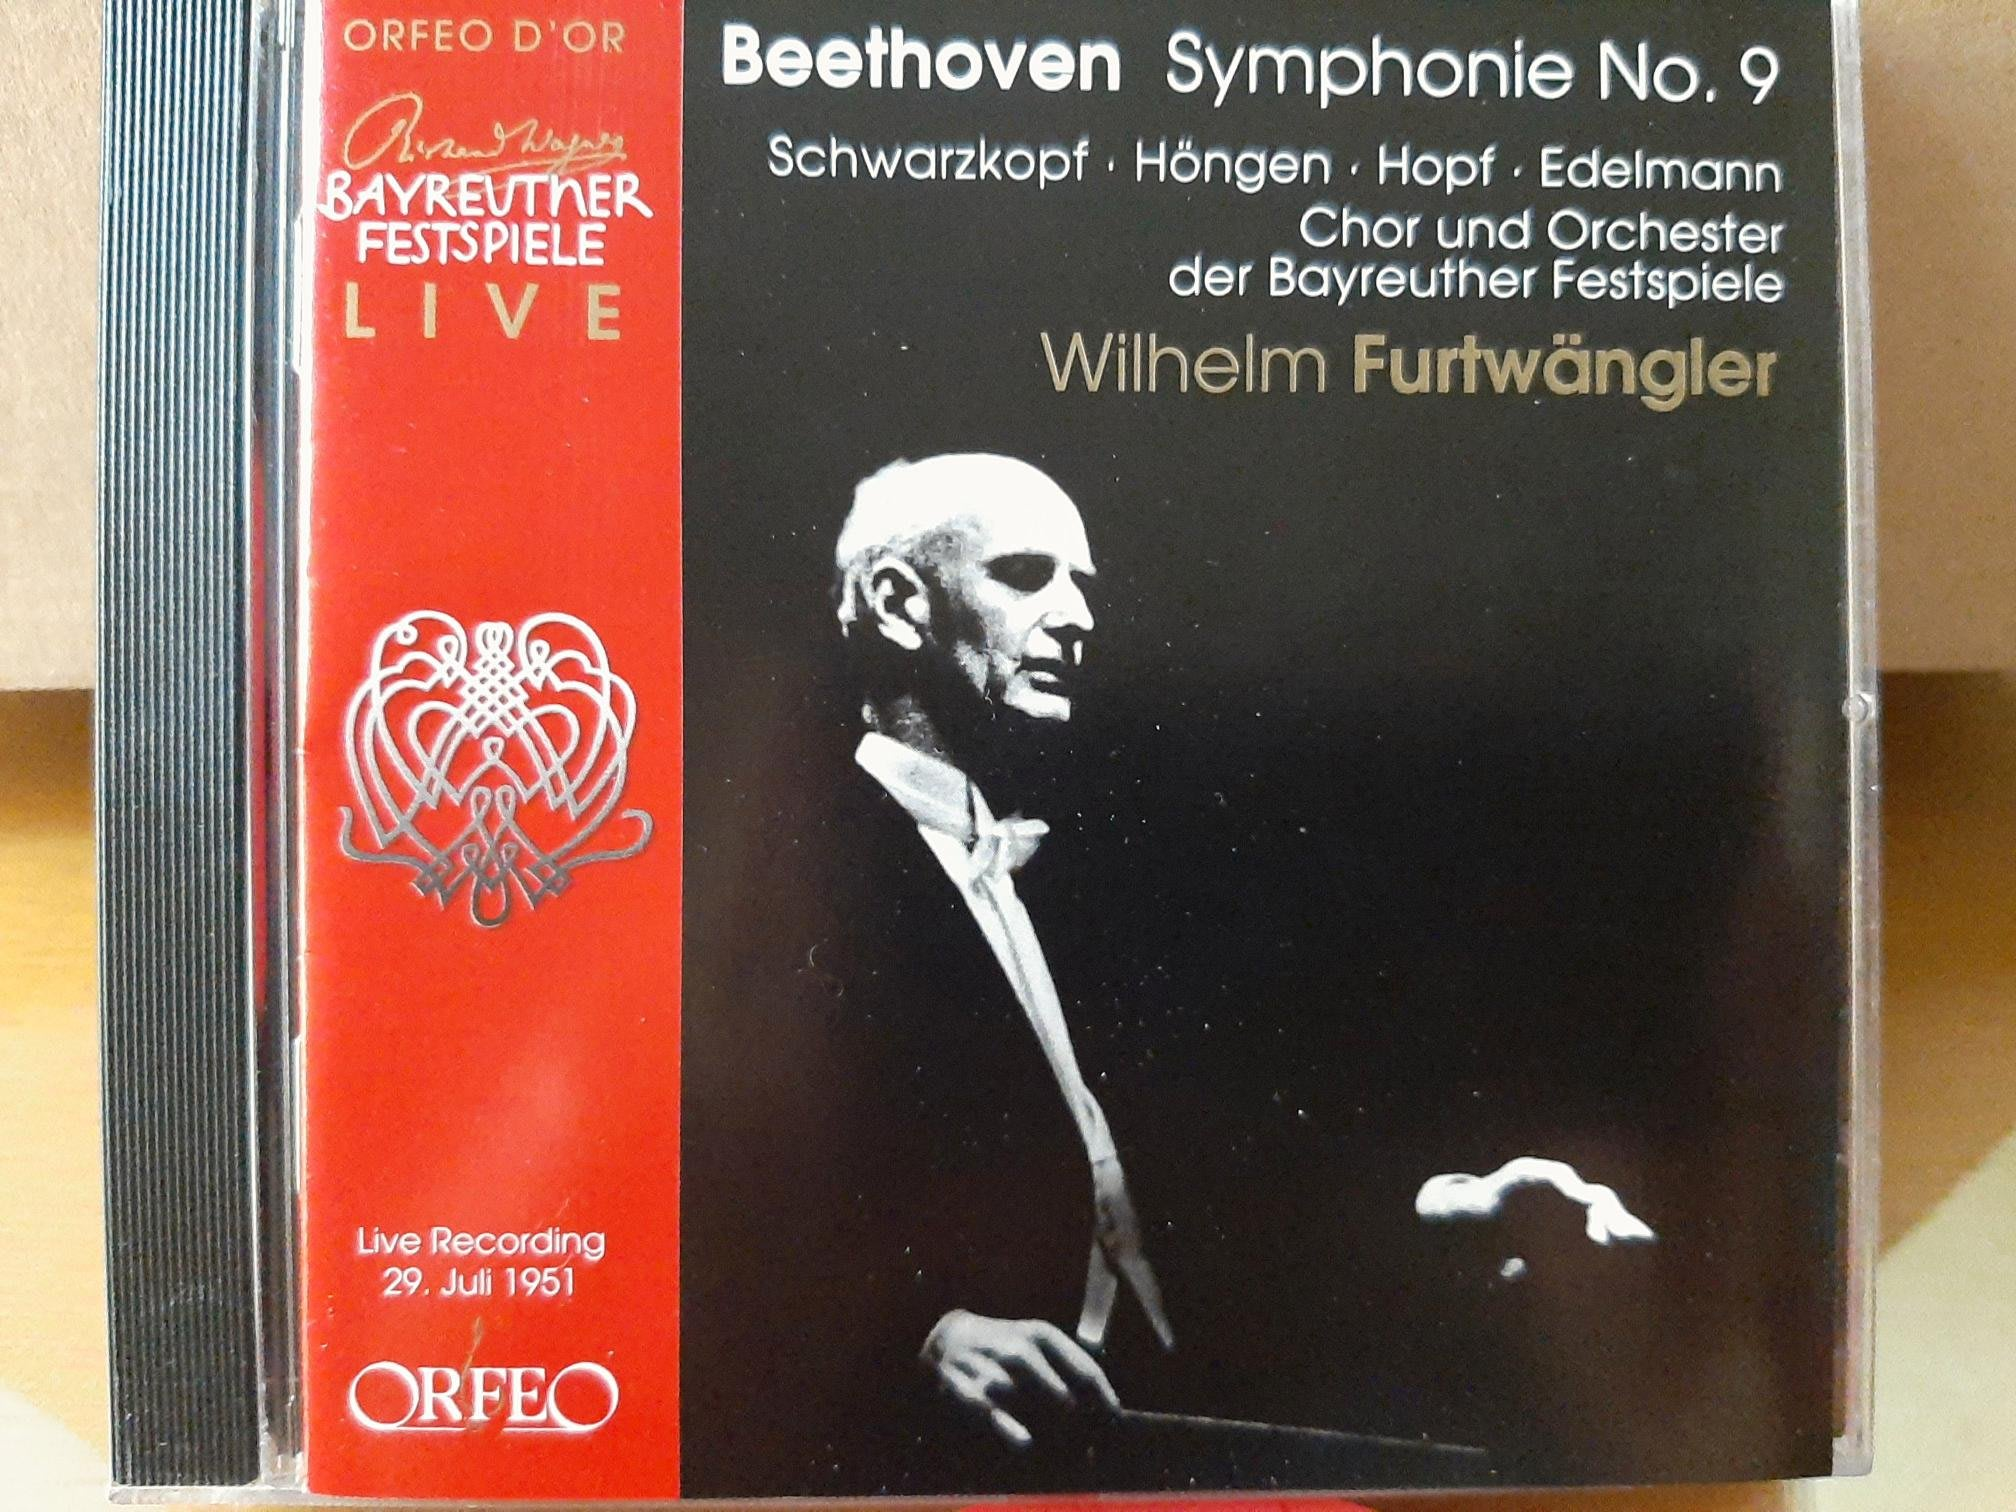 Furtwangler,Beethoven-Sym No.9Choral福特萬格勒指揮貝魯特節慶管弦及合唱團(舒瓦茲柯芙等)演繹貝多芬-第9號交響曲合唱